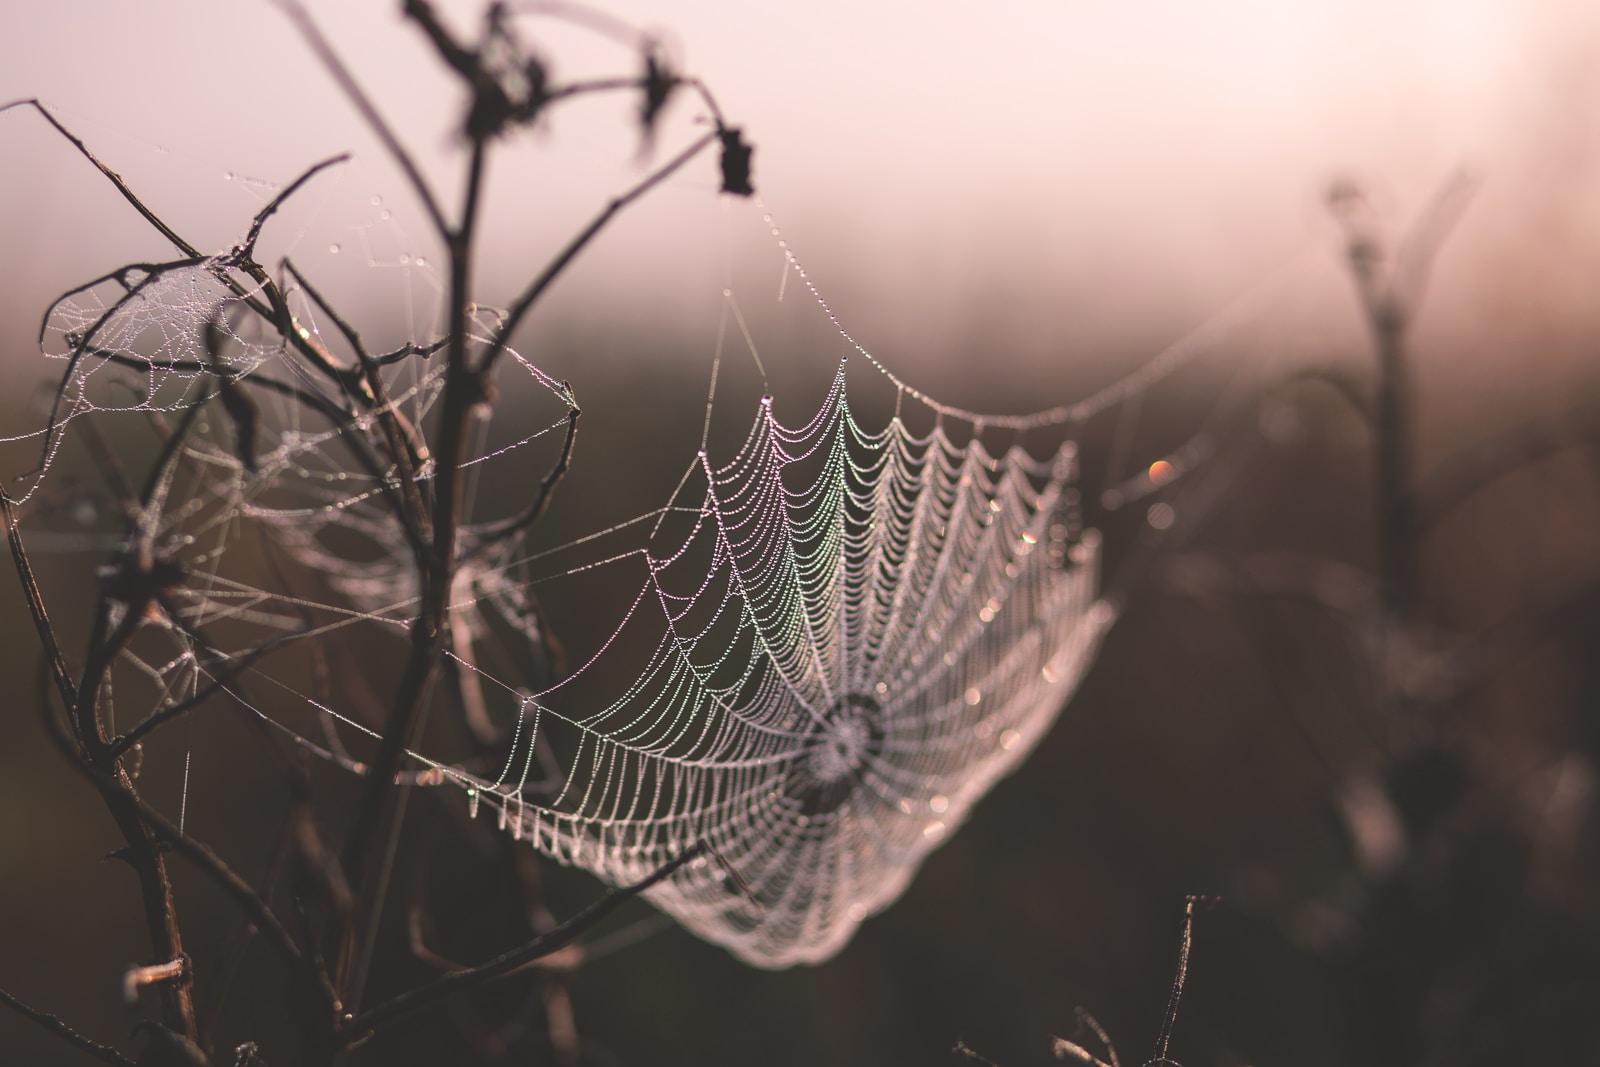 macro shot of spider web